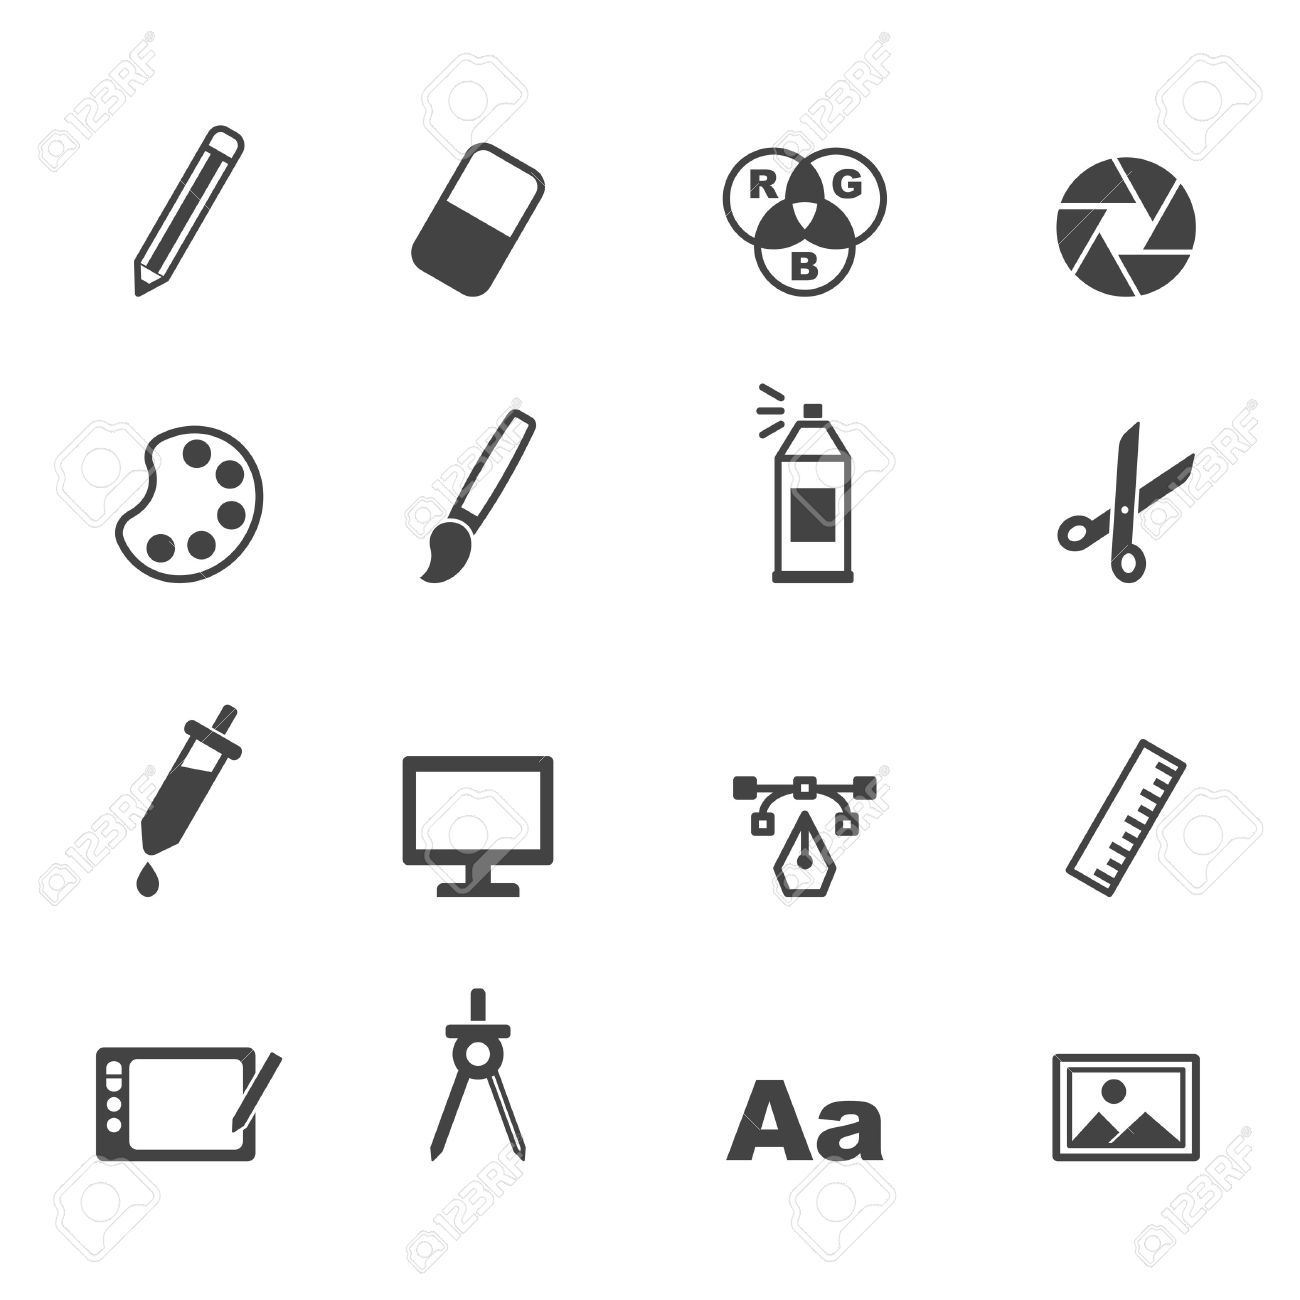 graphic design icons mono